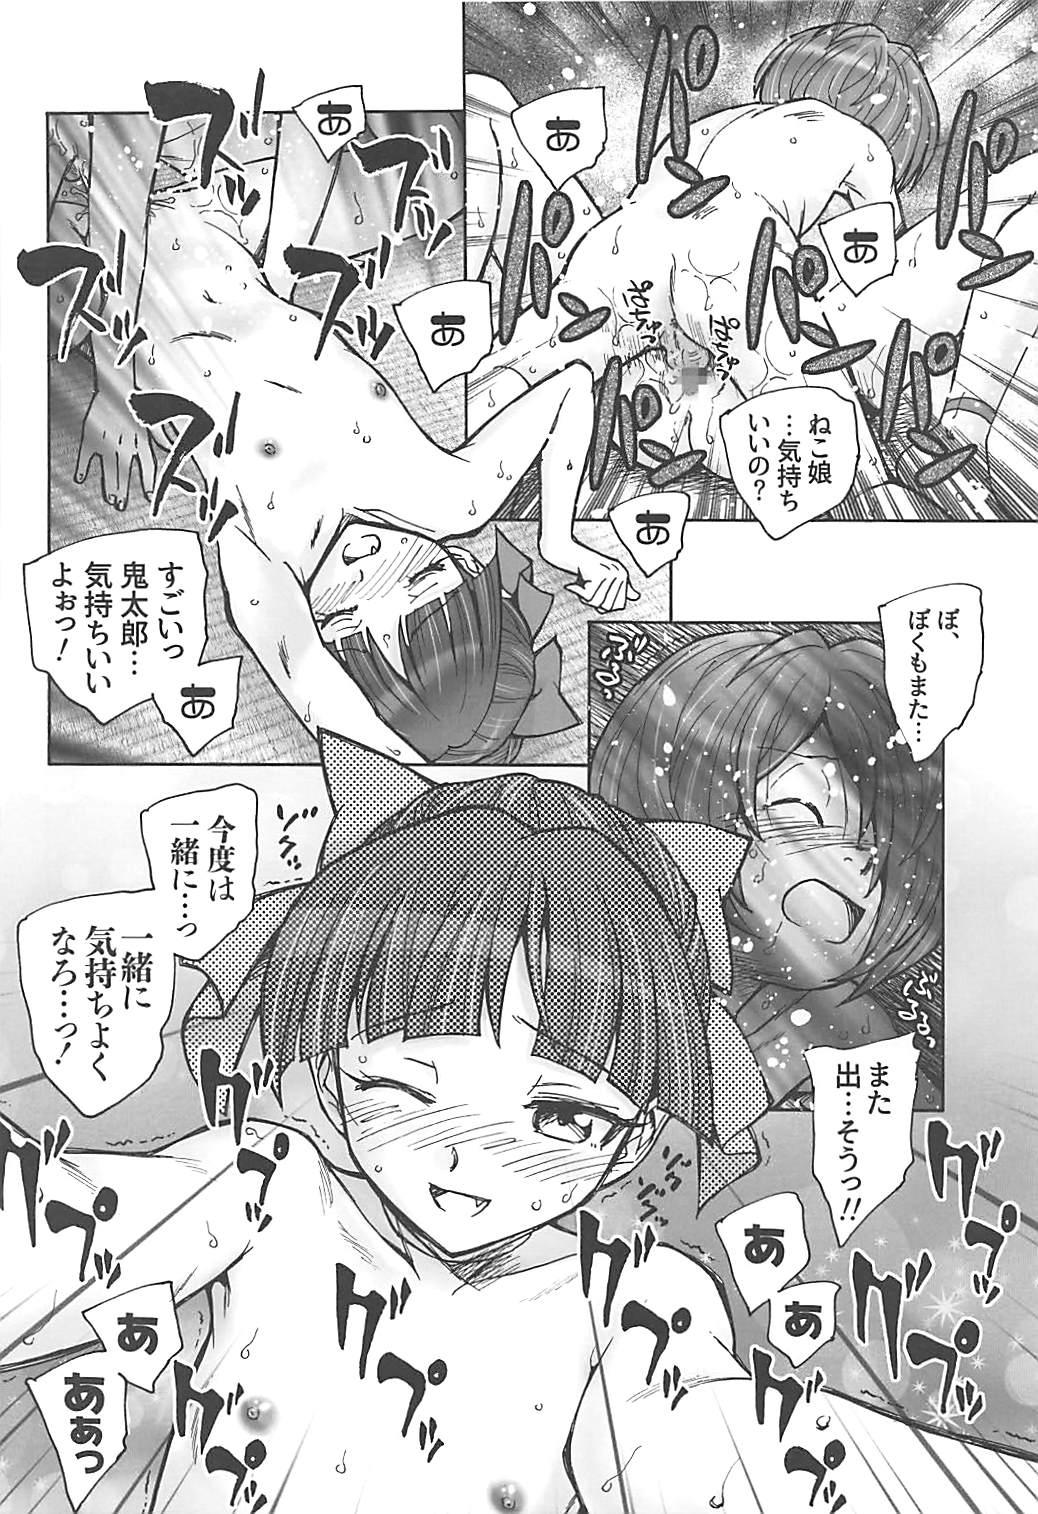 Neko Musume no Ii Kimochi - Cat Girl's Ecstasy 20